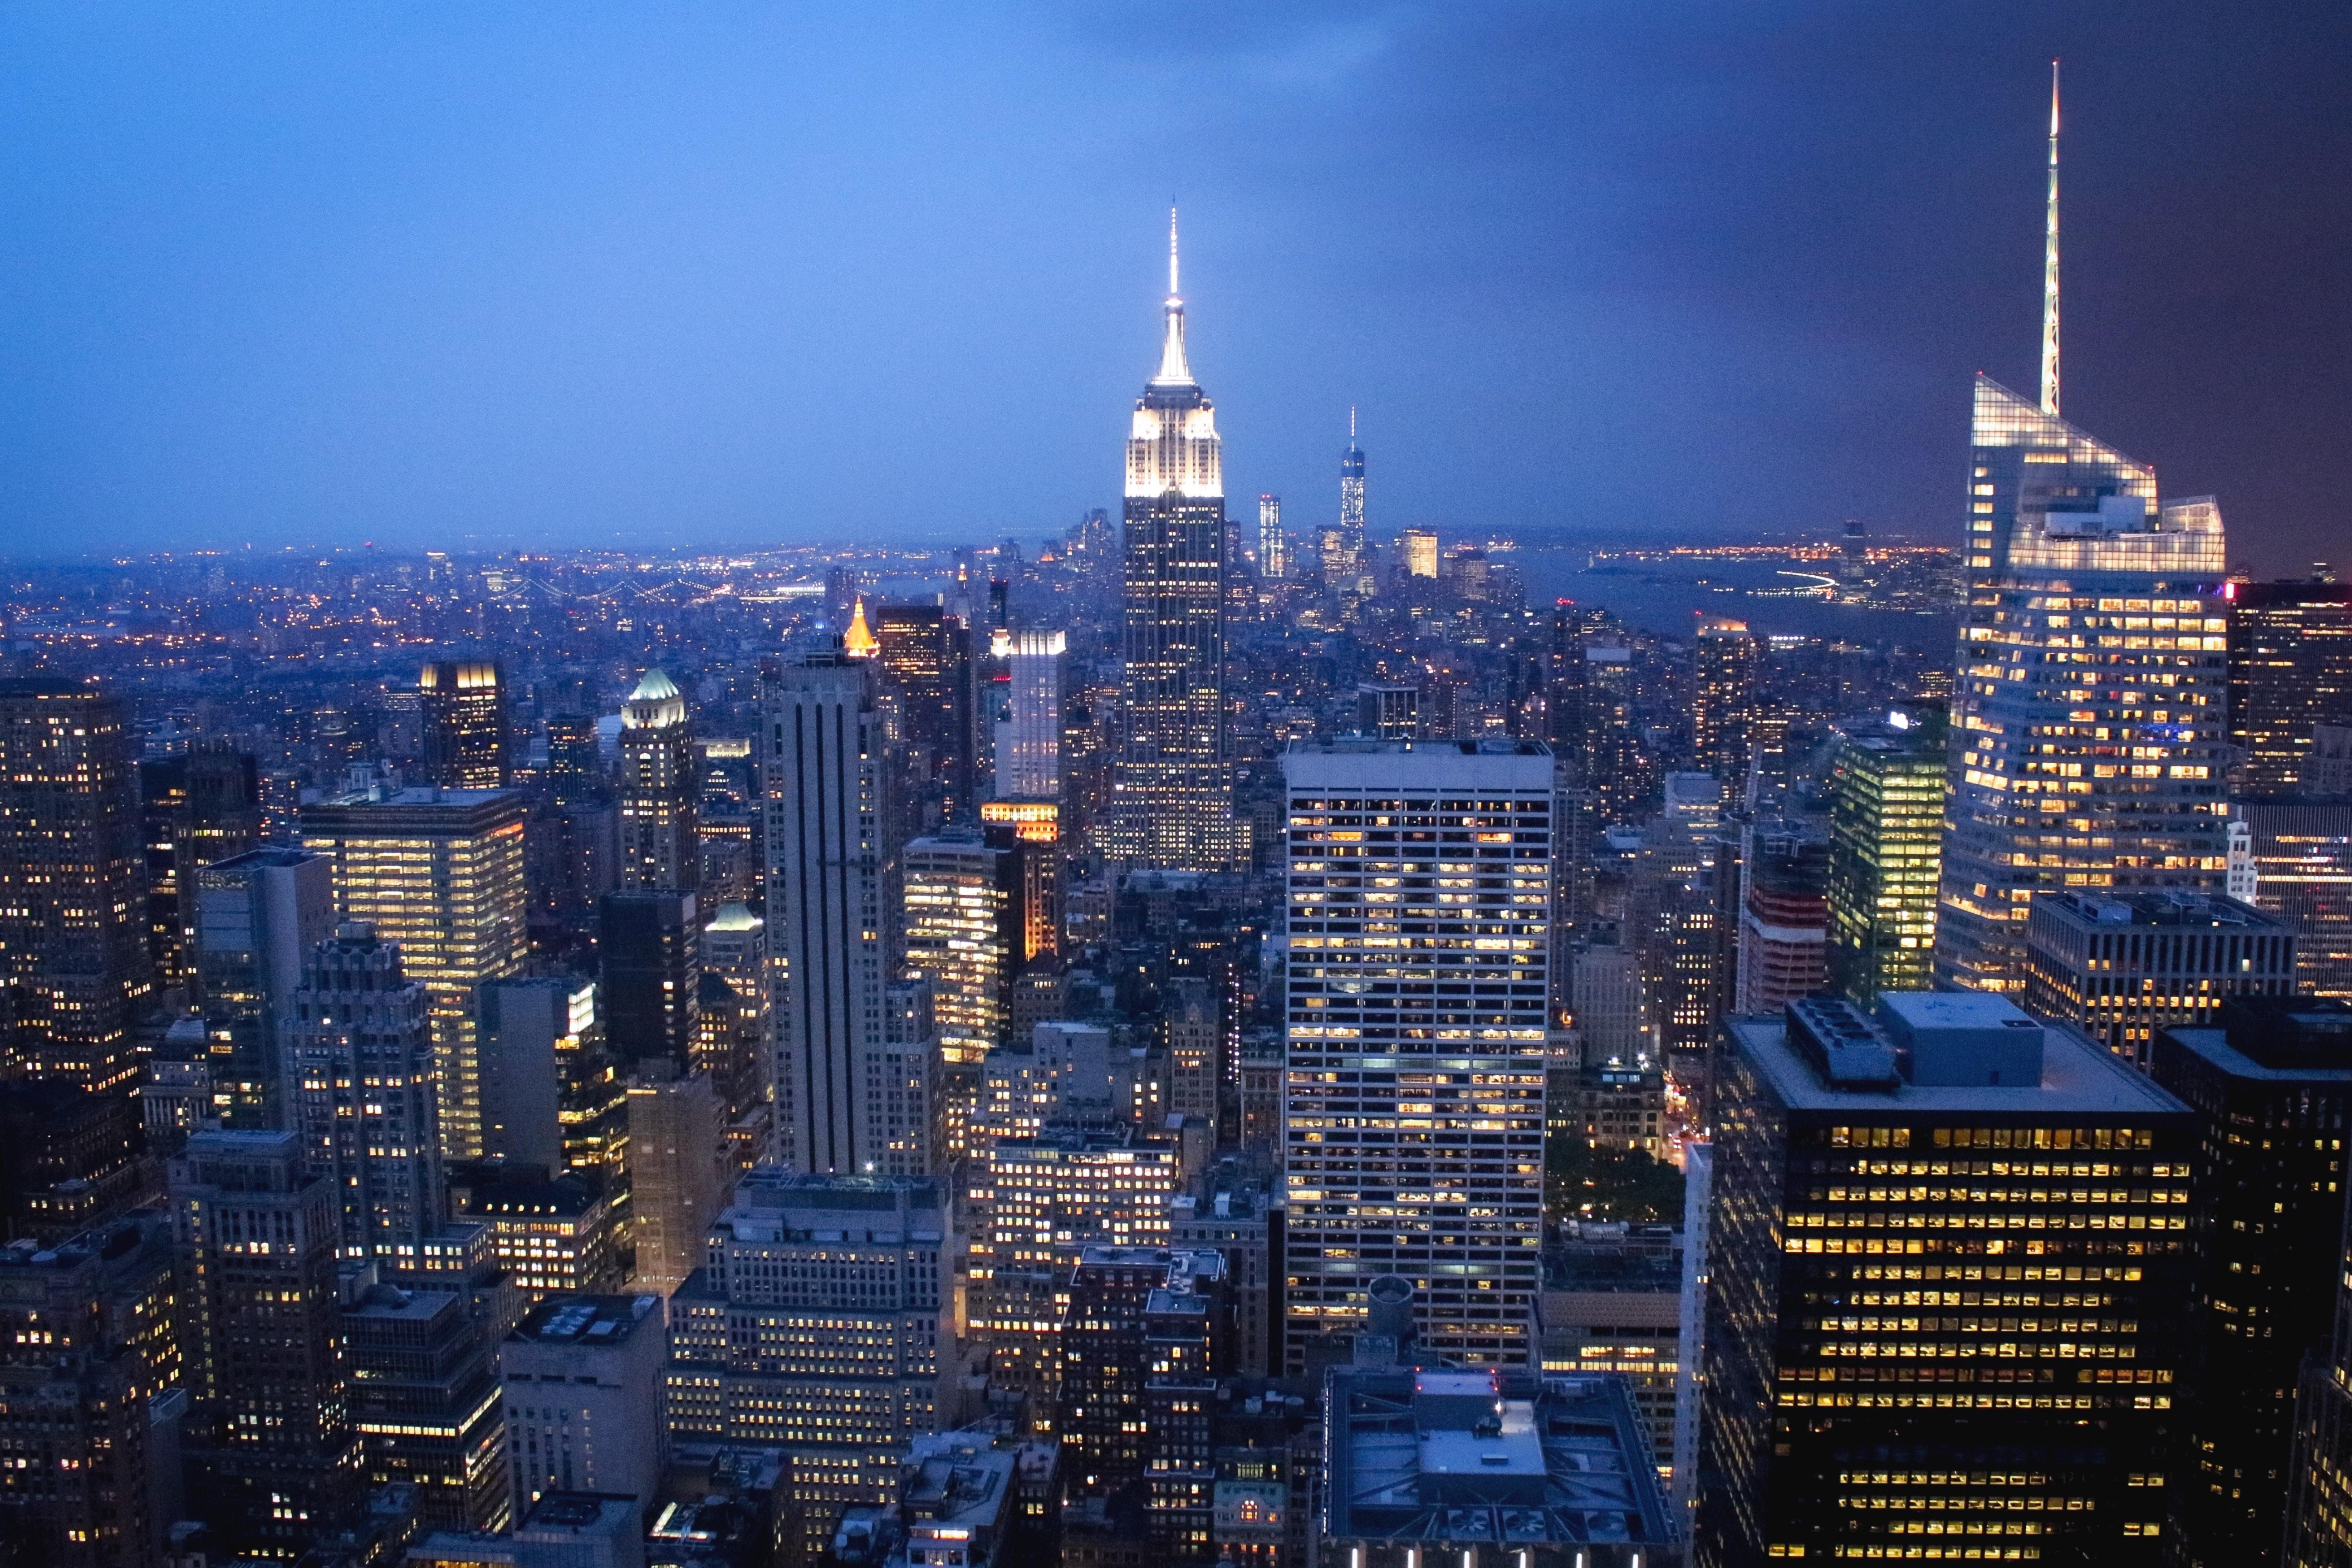 Aerial view of skyscraper buildings photo